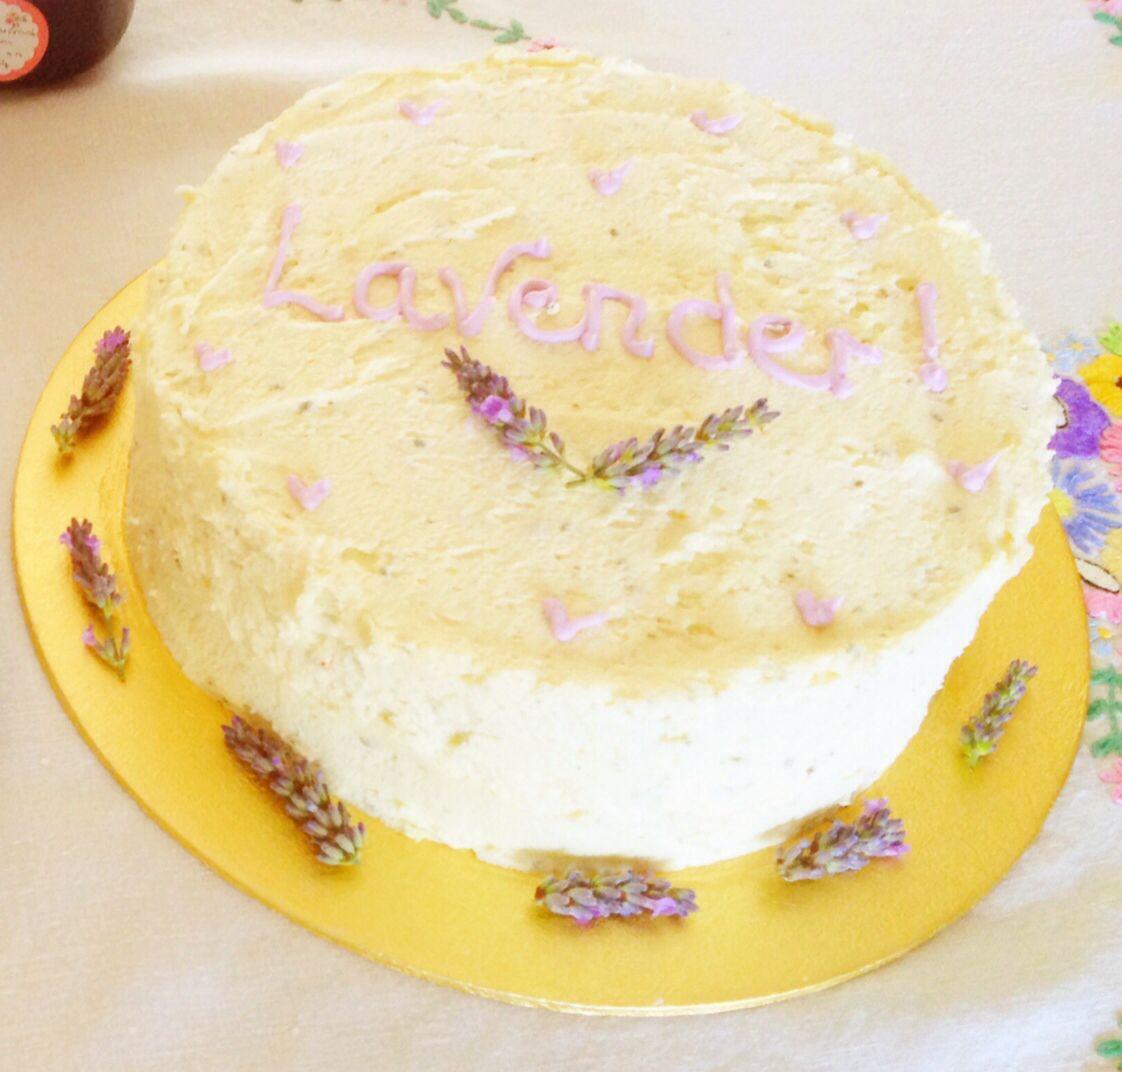 Lavender sponge cake with lavender and vanilla frosting.